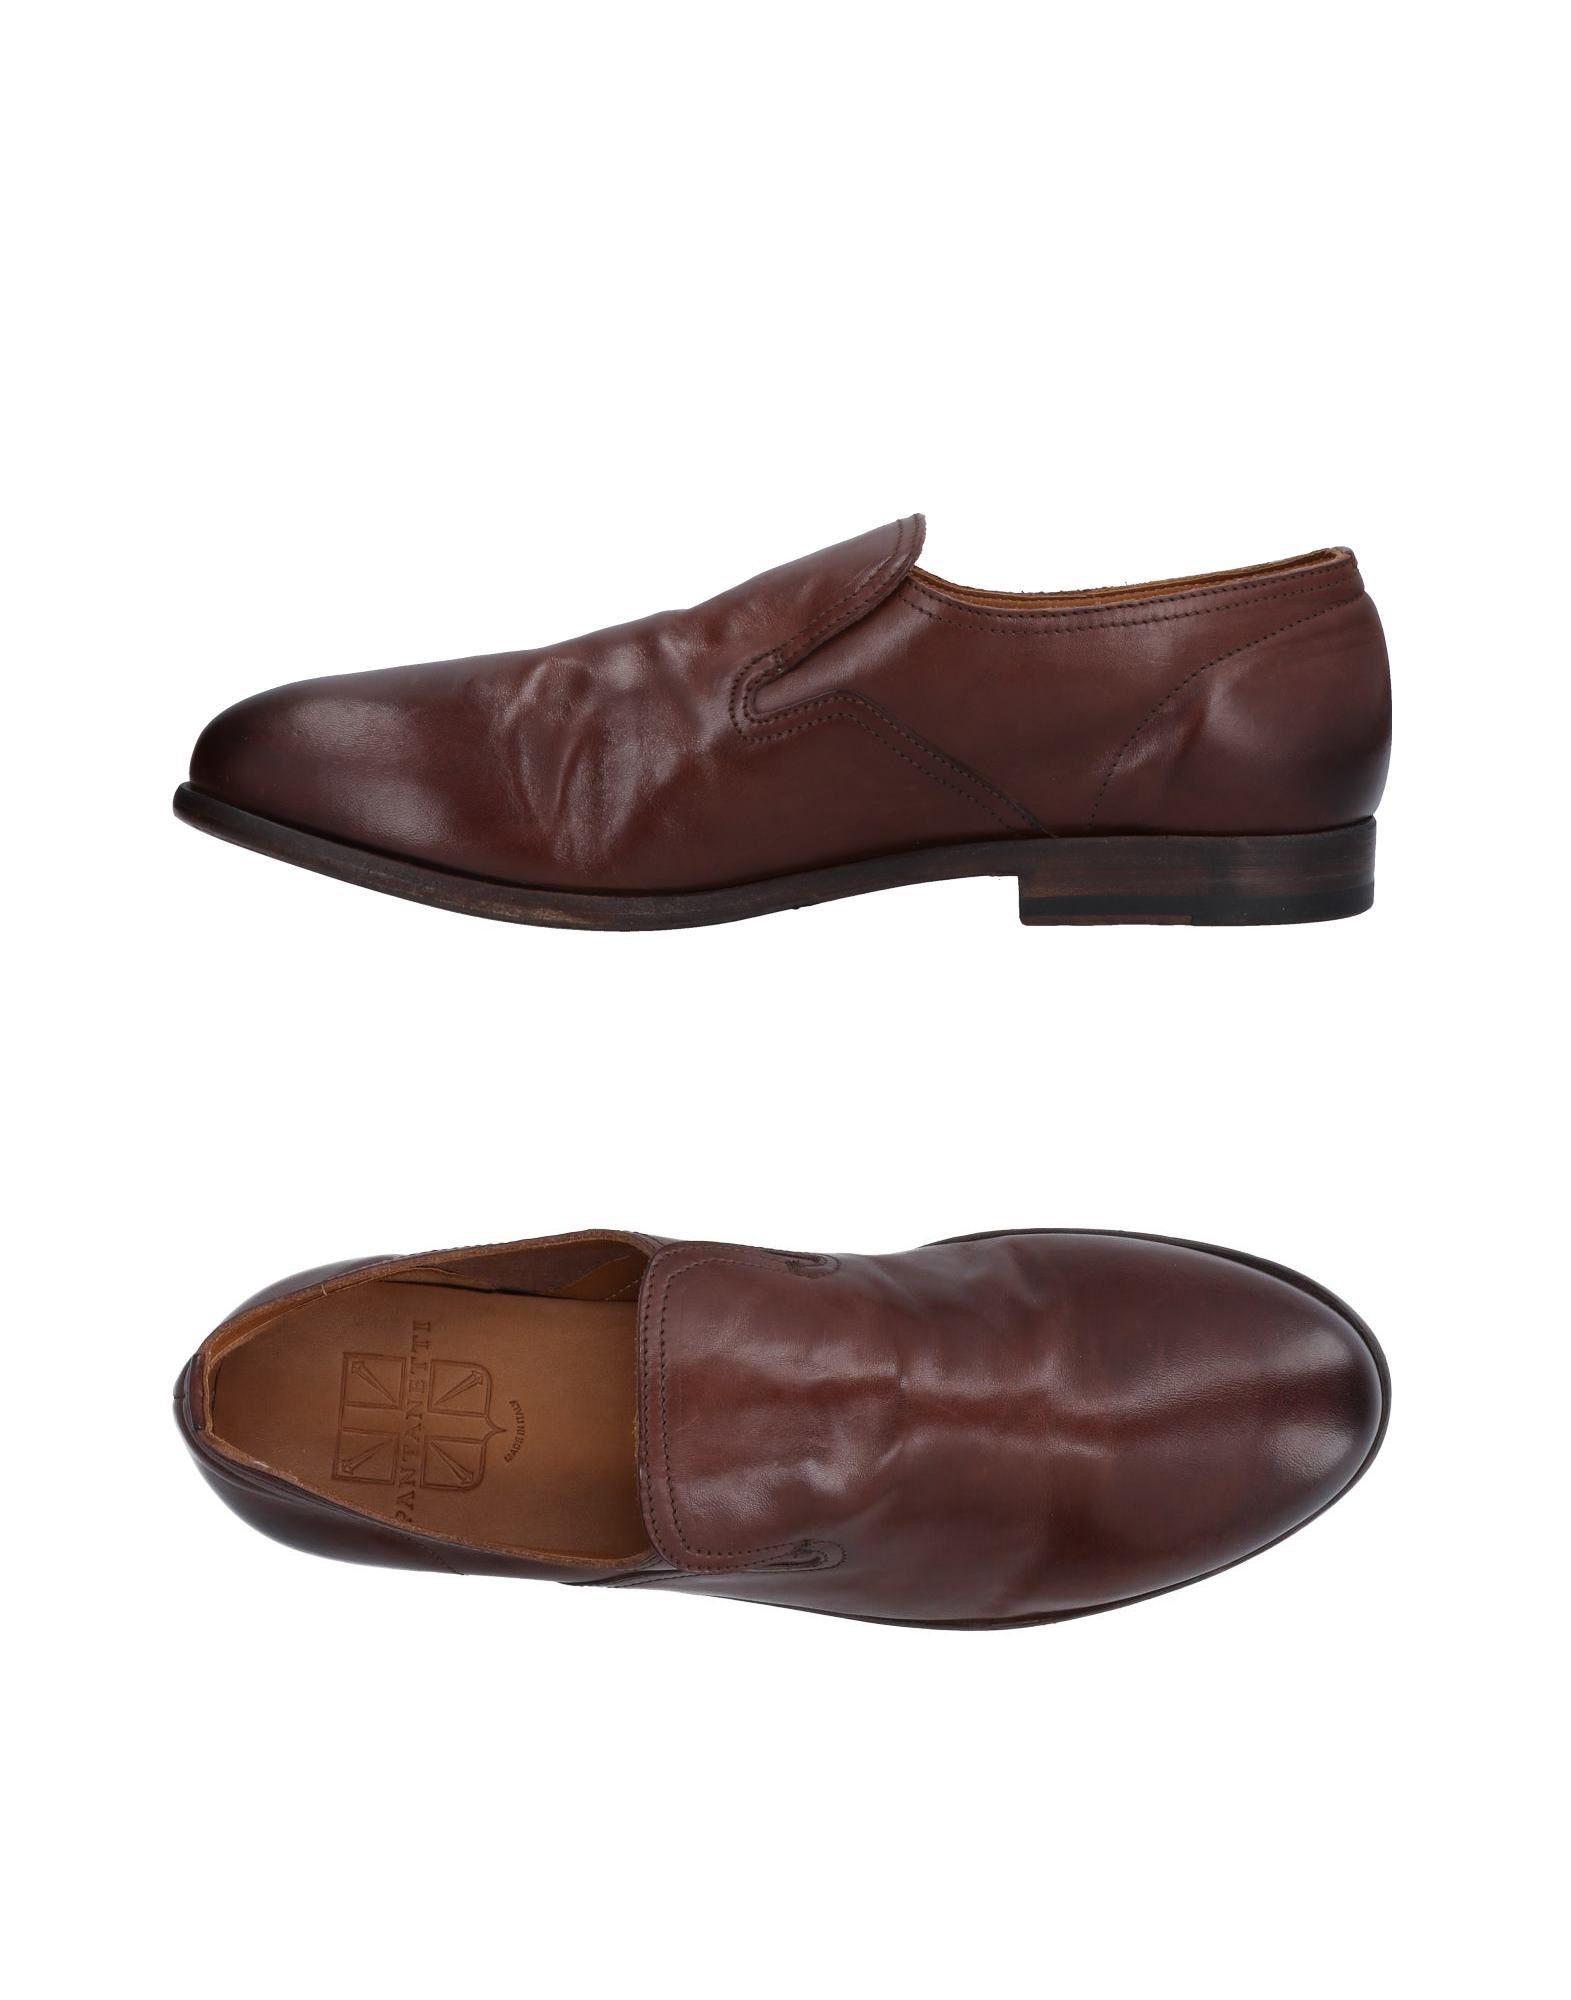 Pantanetti Mokassins Herren beliebte  11503877KJ Gute Qualität beliebte Herren Schuhe 631f5d